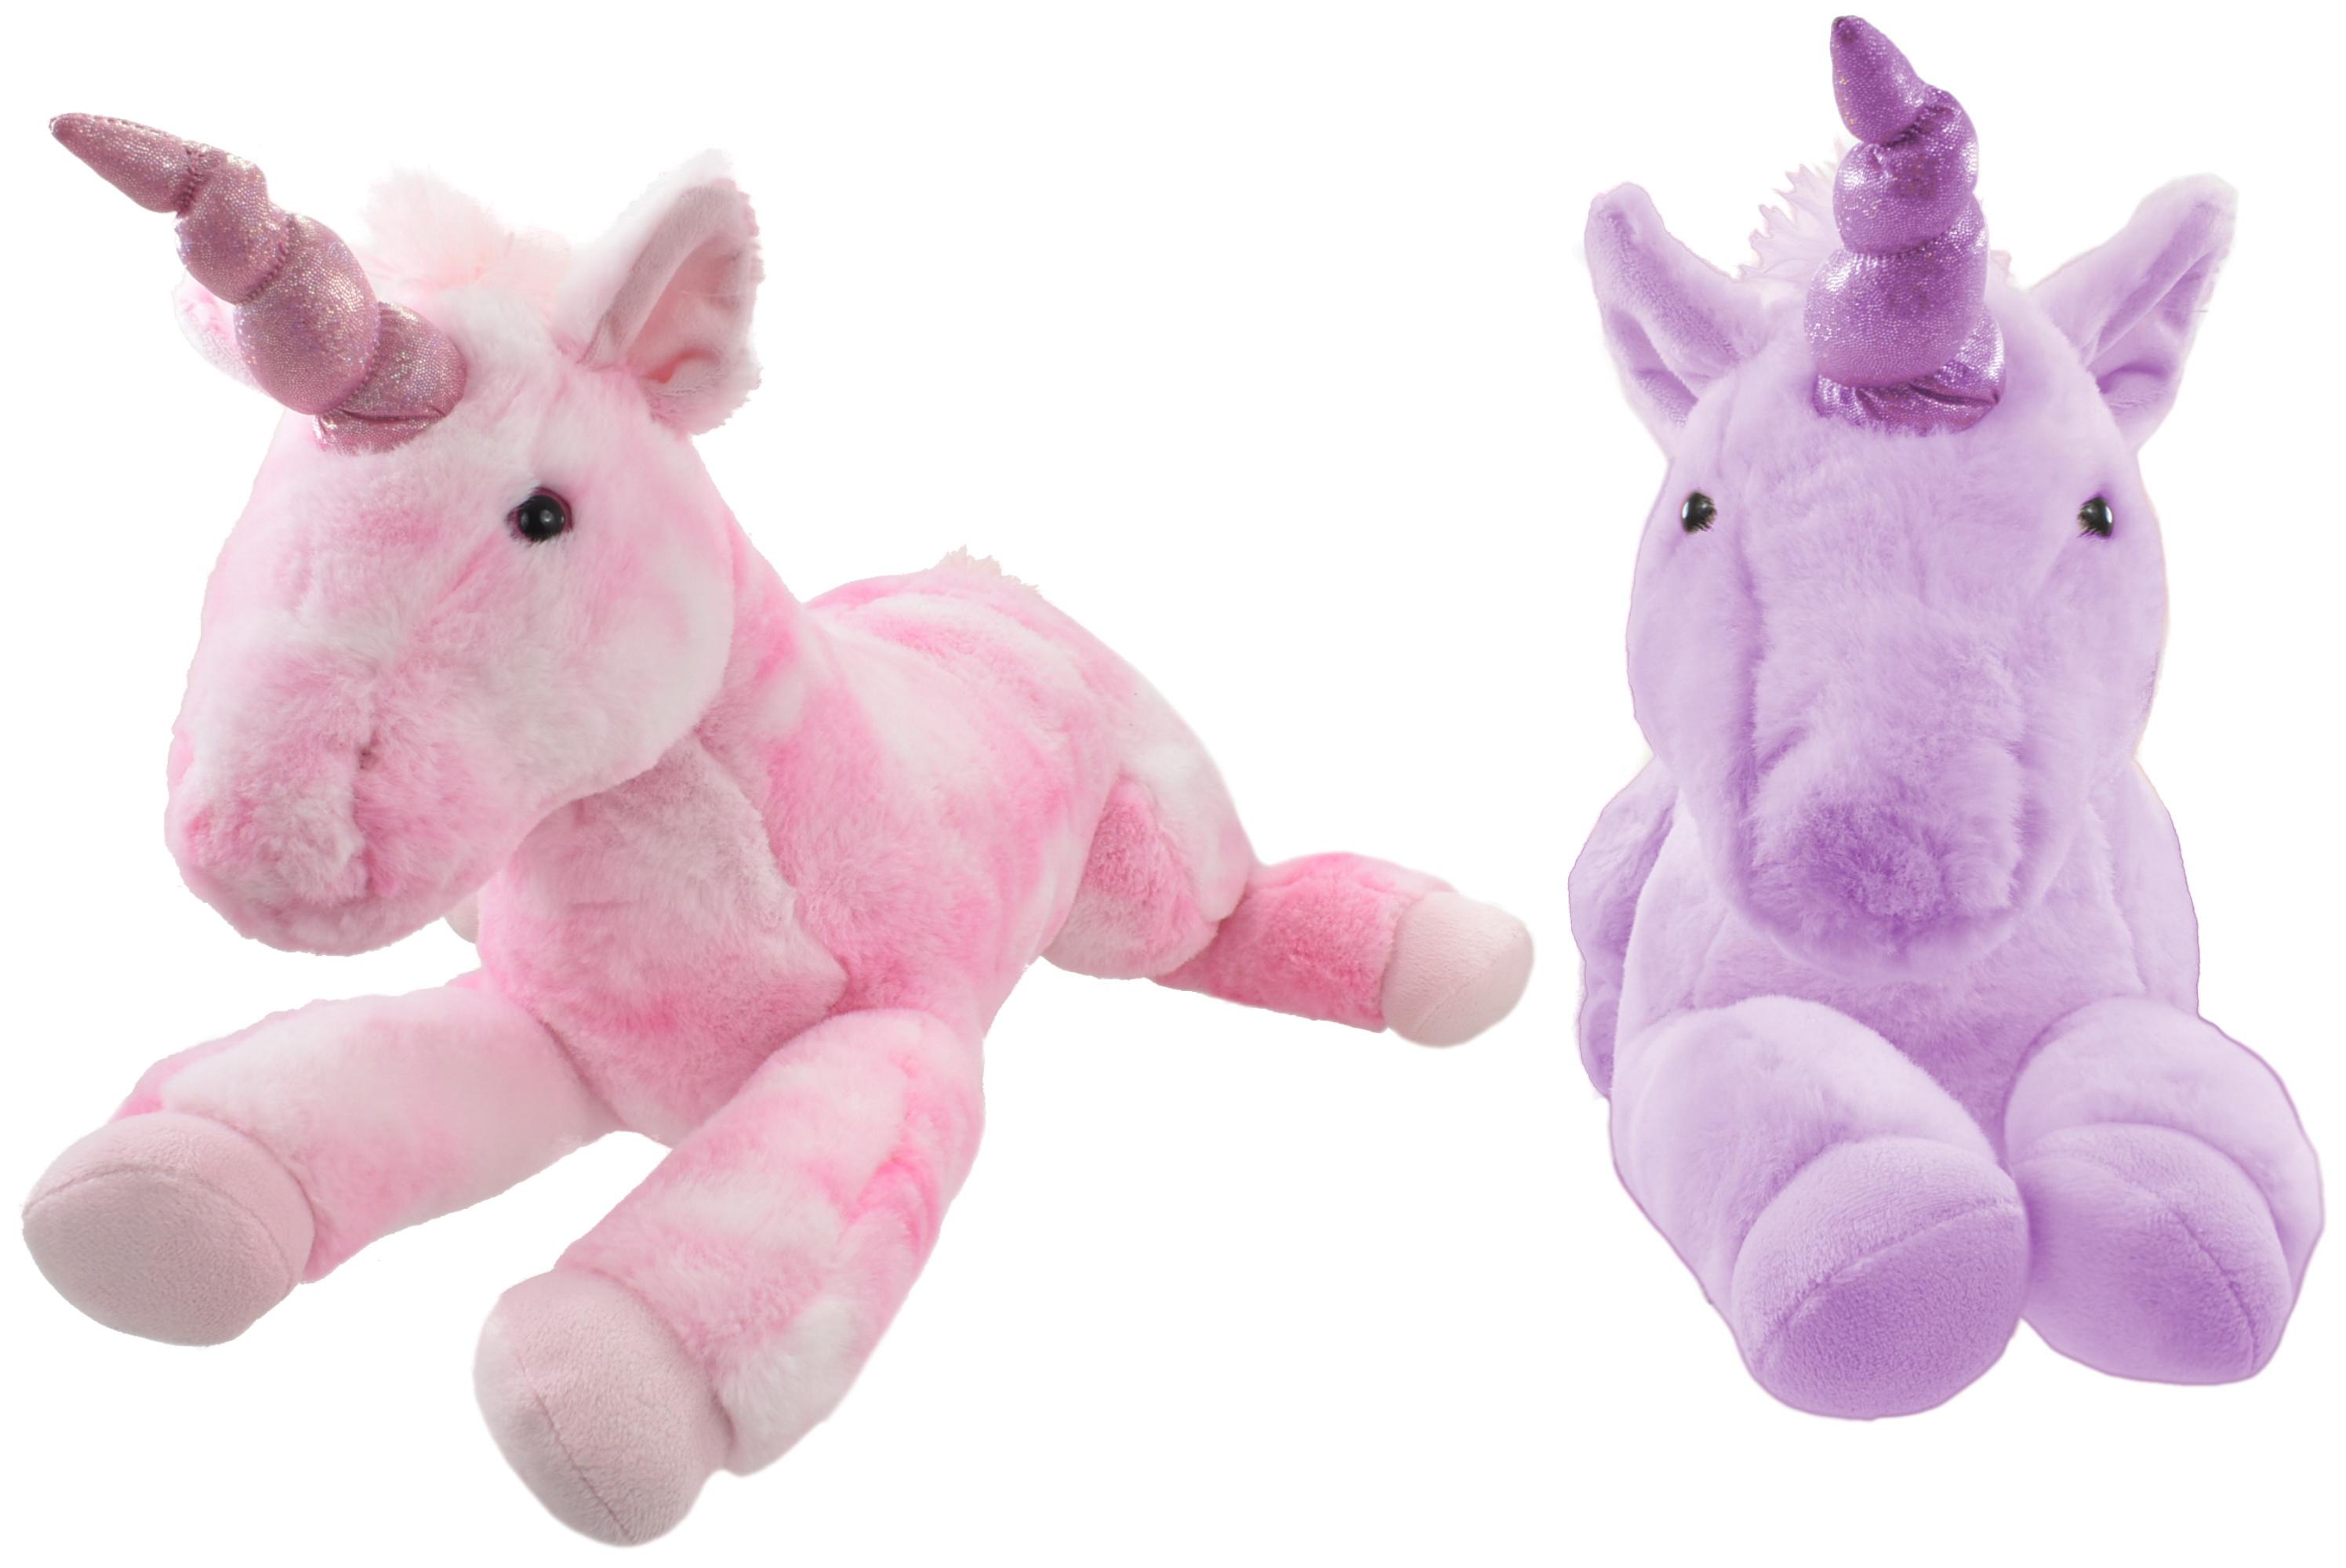 55cm Plush Lying Down Unicorns - 2 Assorted Colours